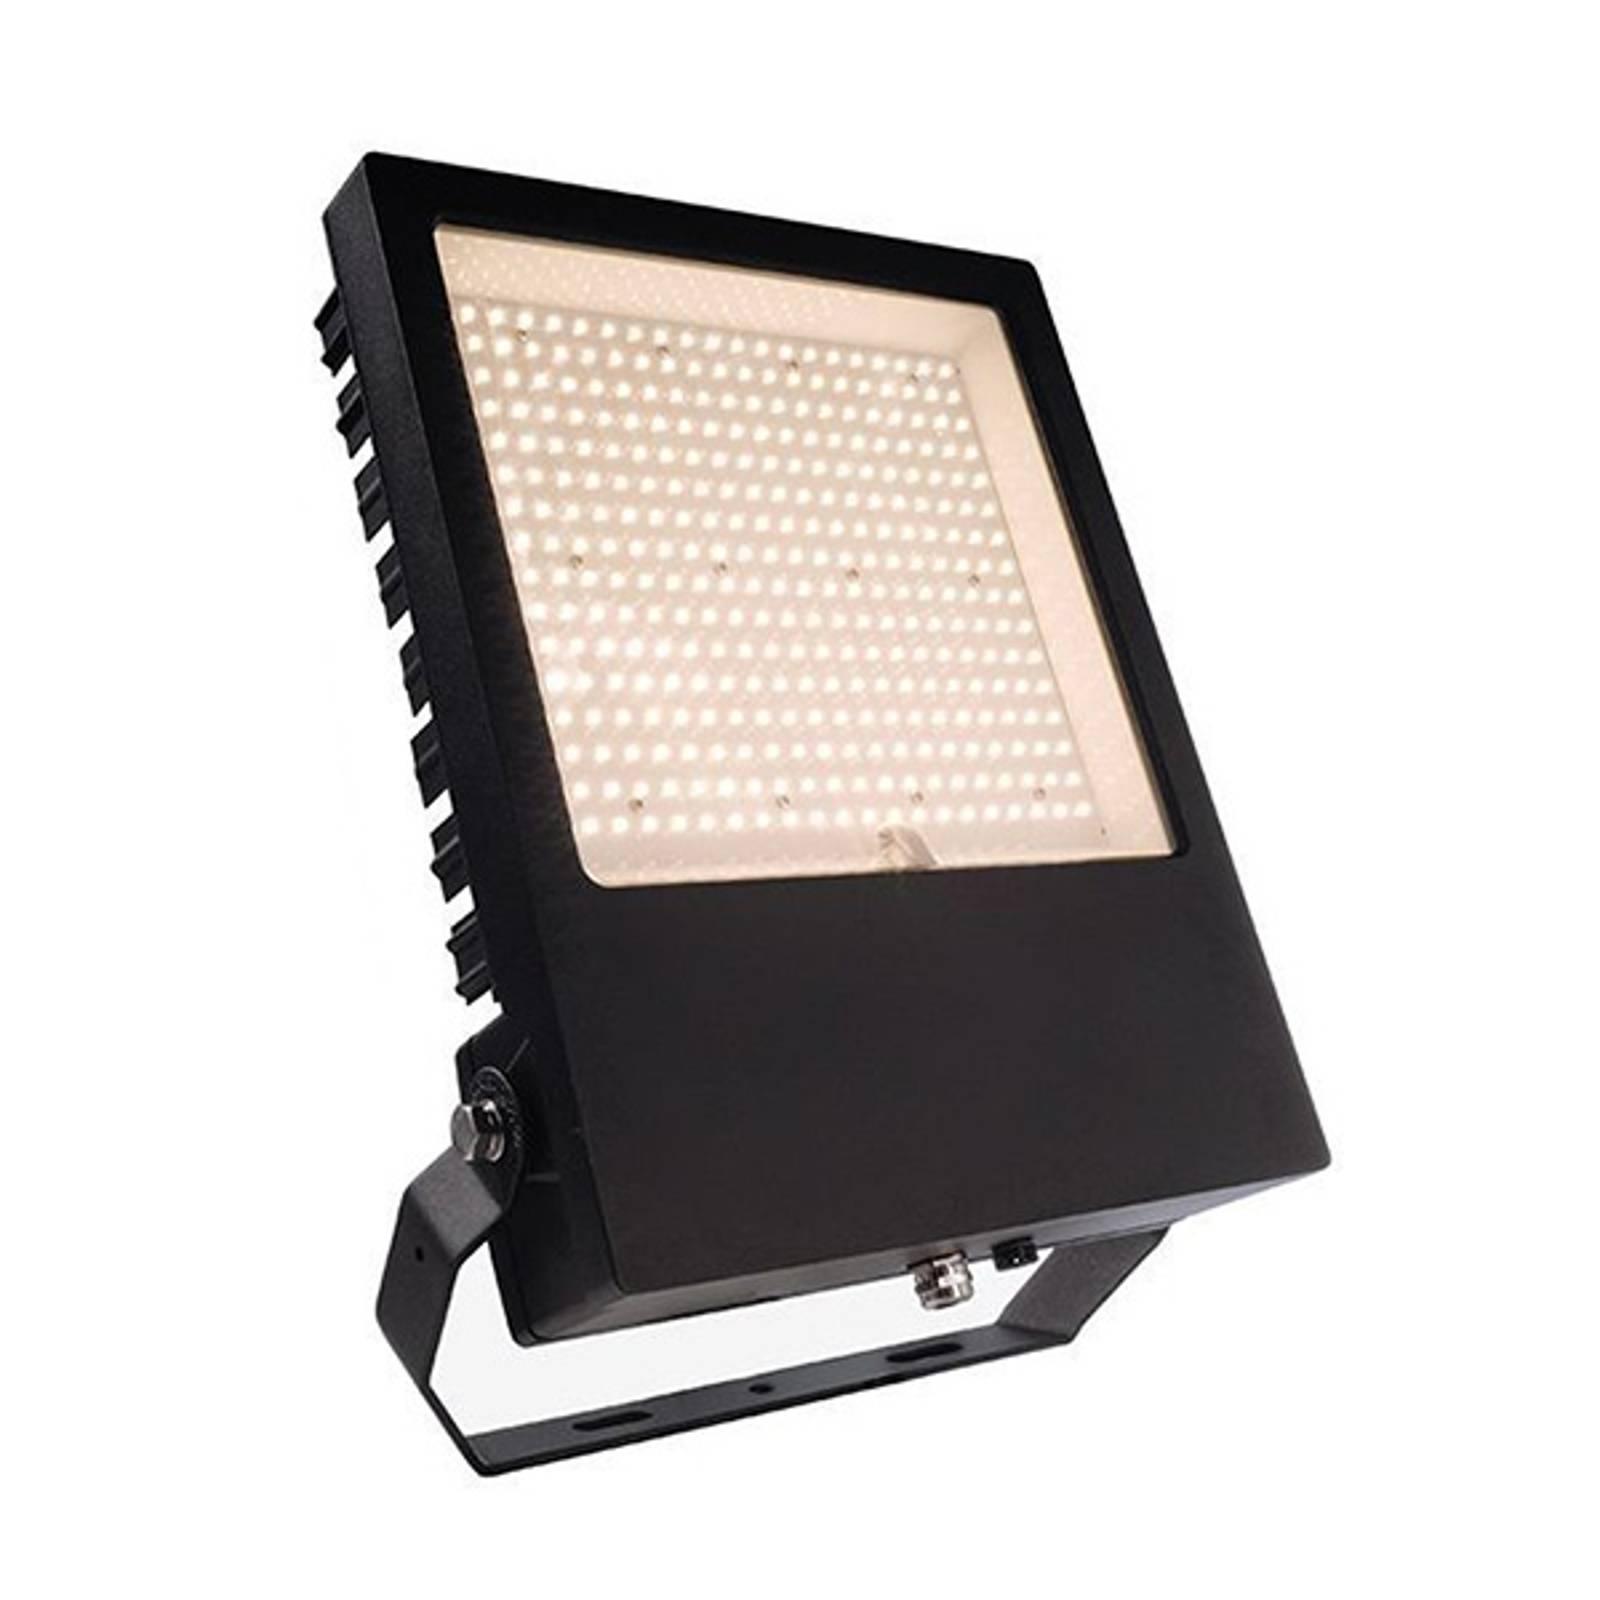 LED-ulkokohdevalaisin, 3 000 K, 200 W